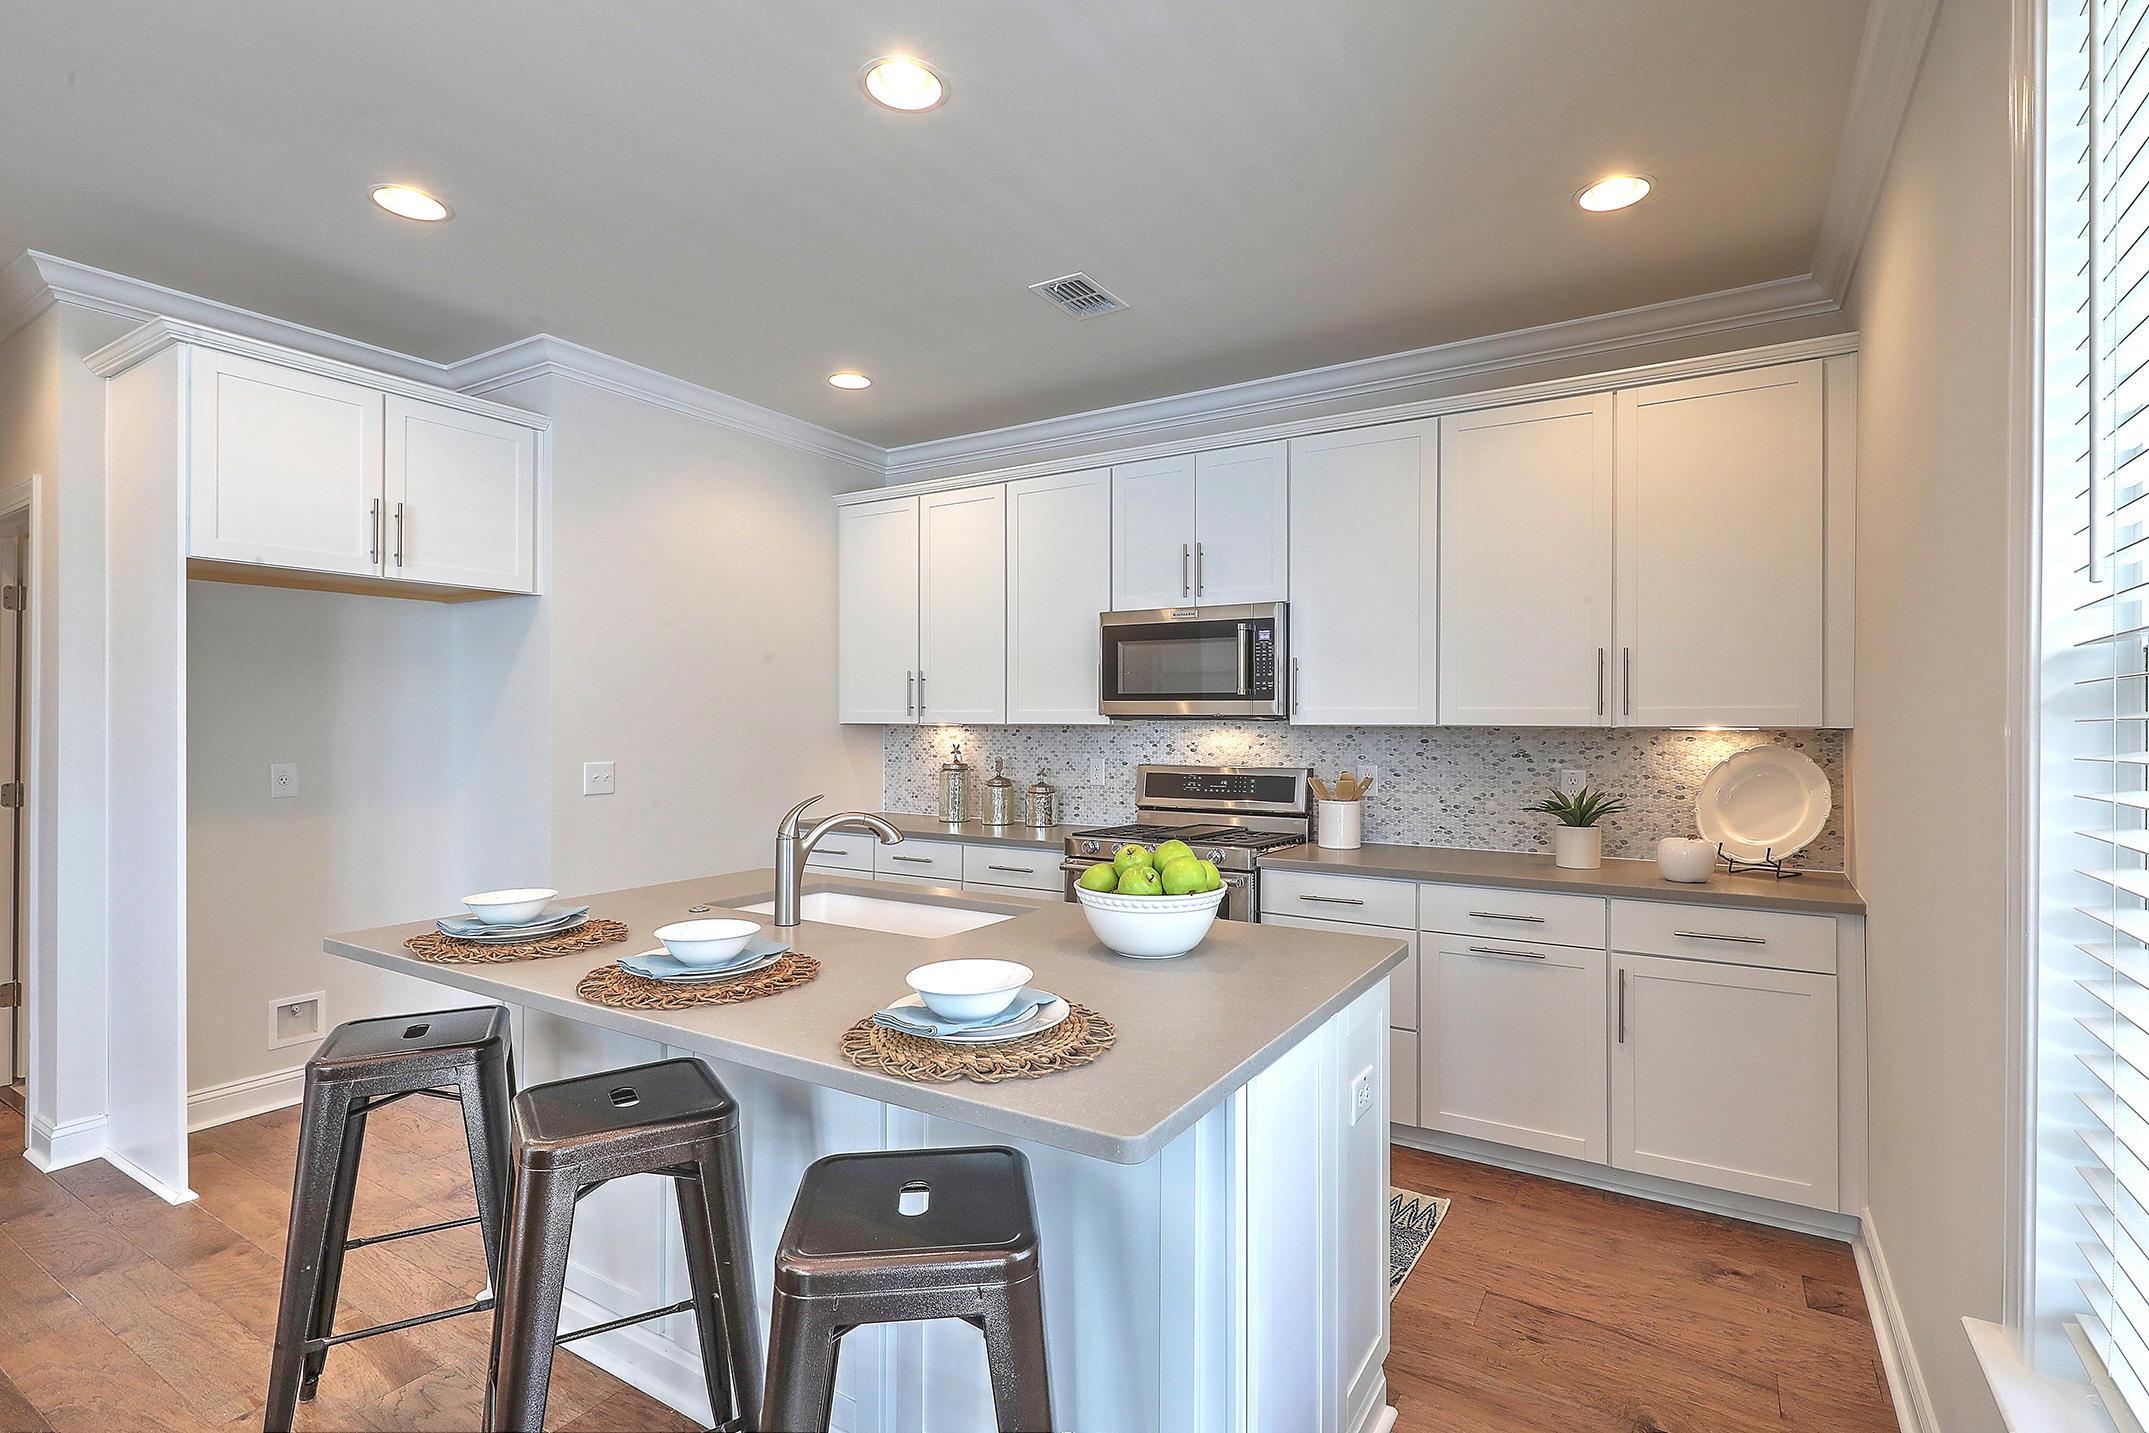 Bentley Park Homes For Sale - 1226 Gannett, Mount Pleasant, SC - 0